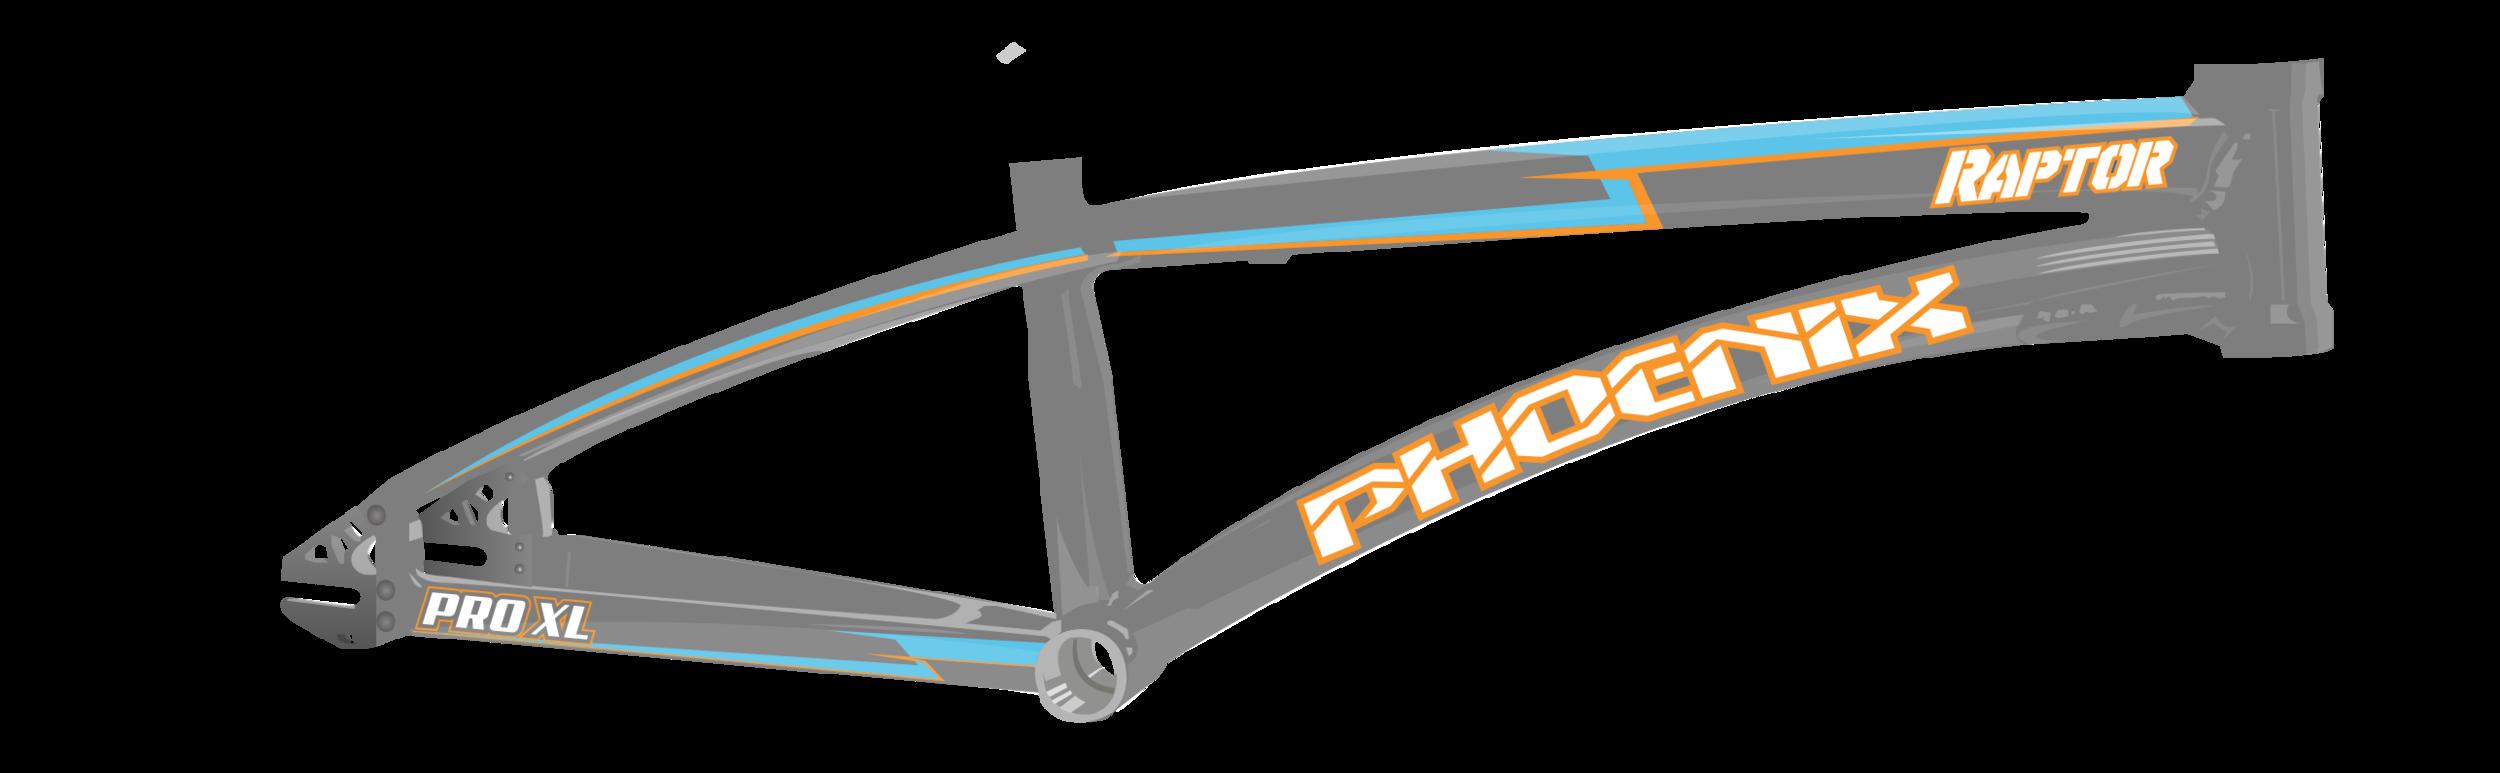 Phoenix Pro Cycles Frame mockup